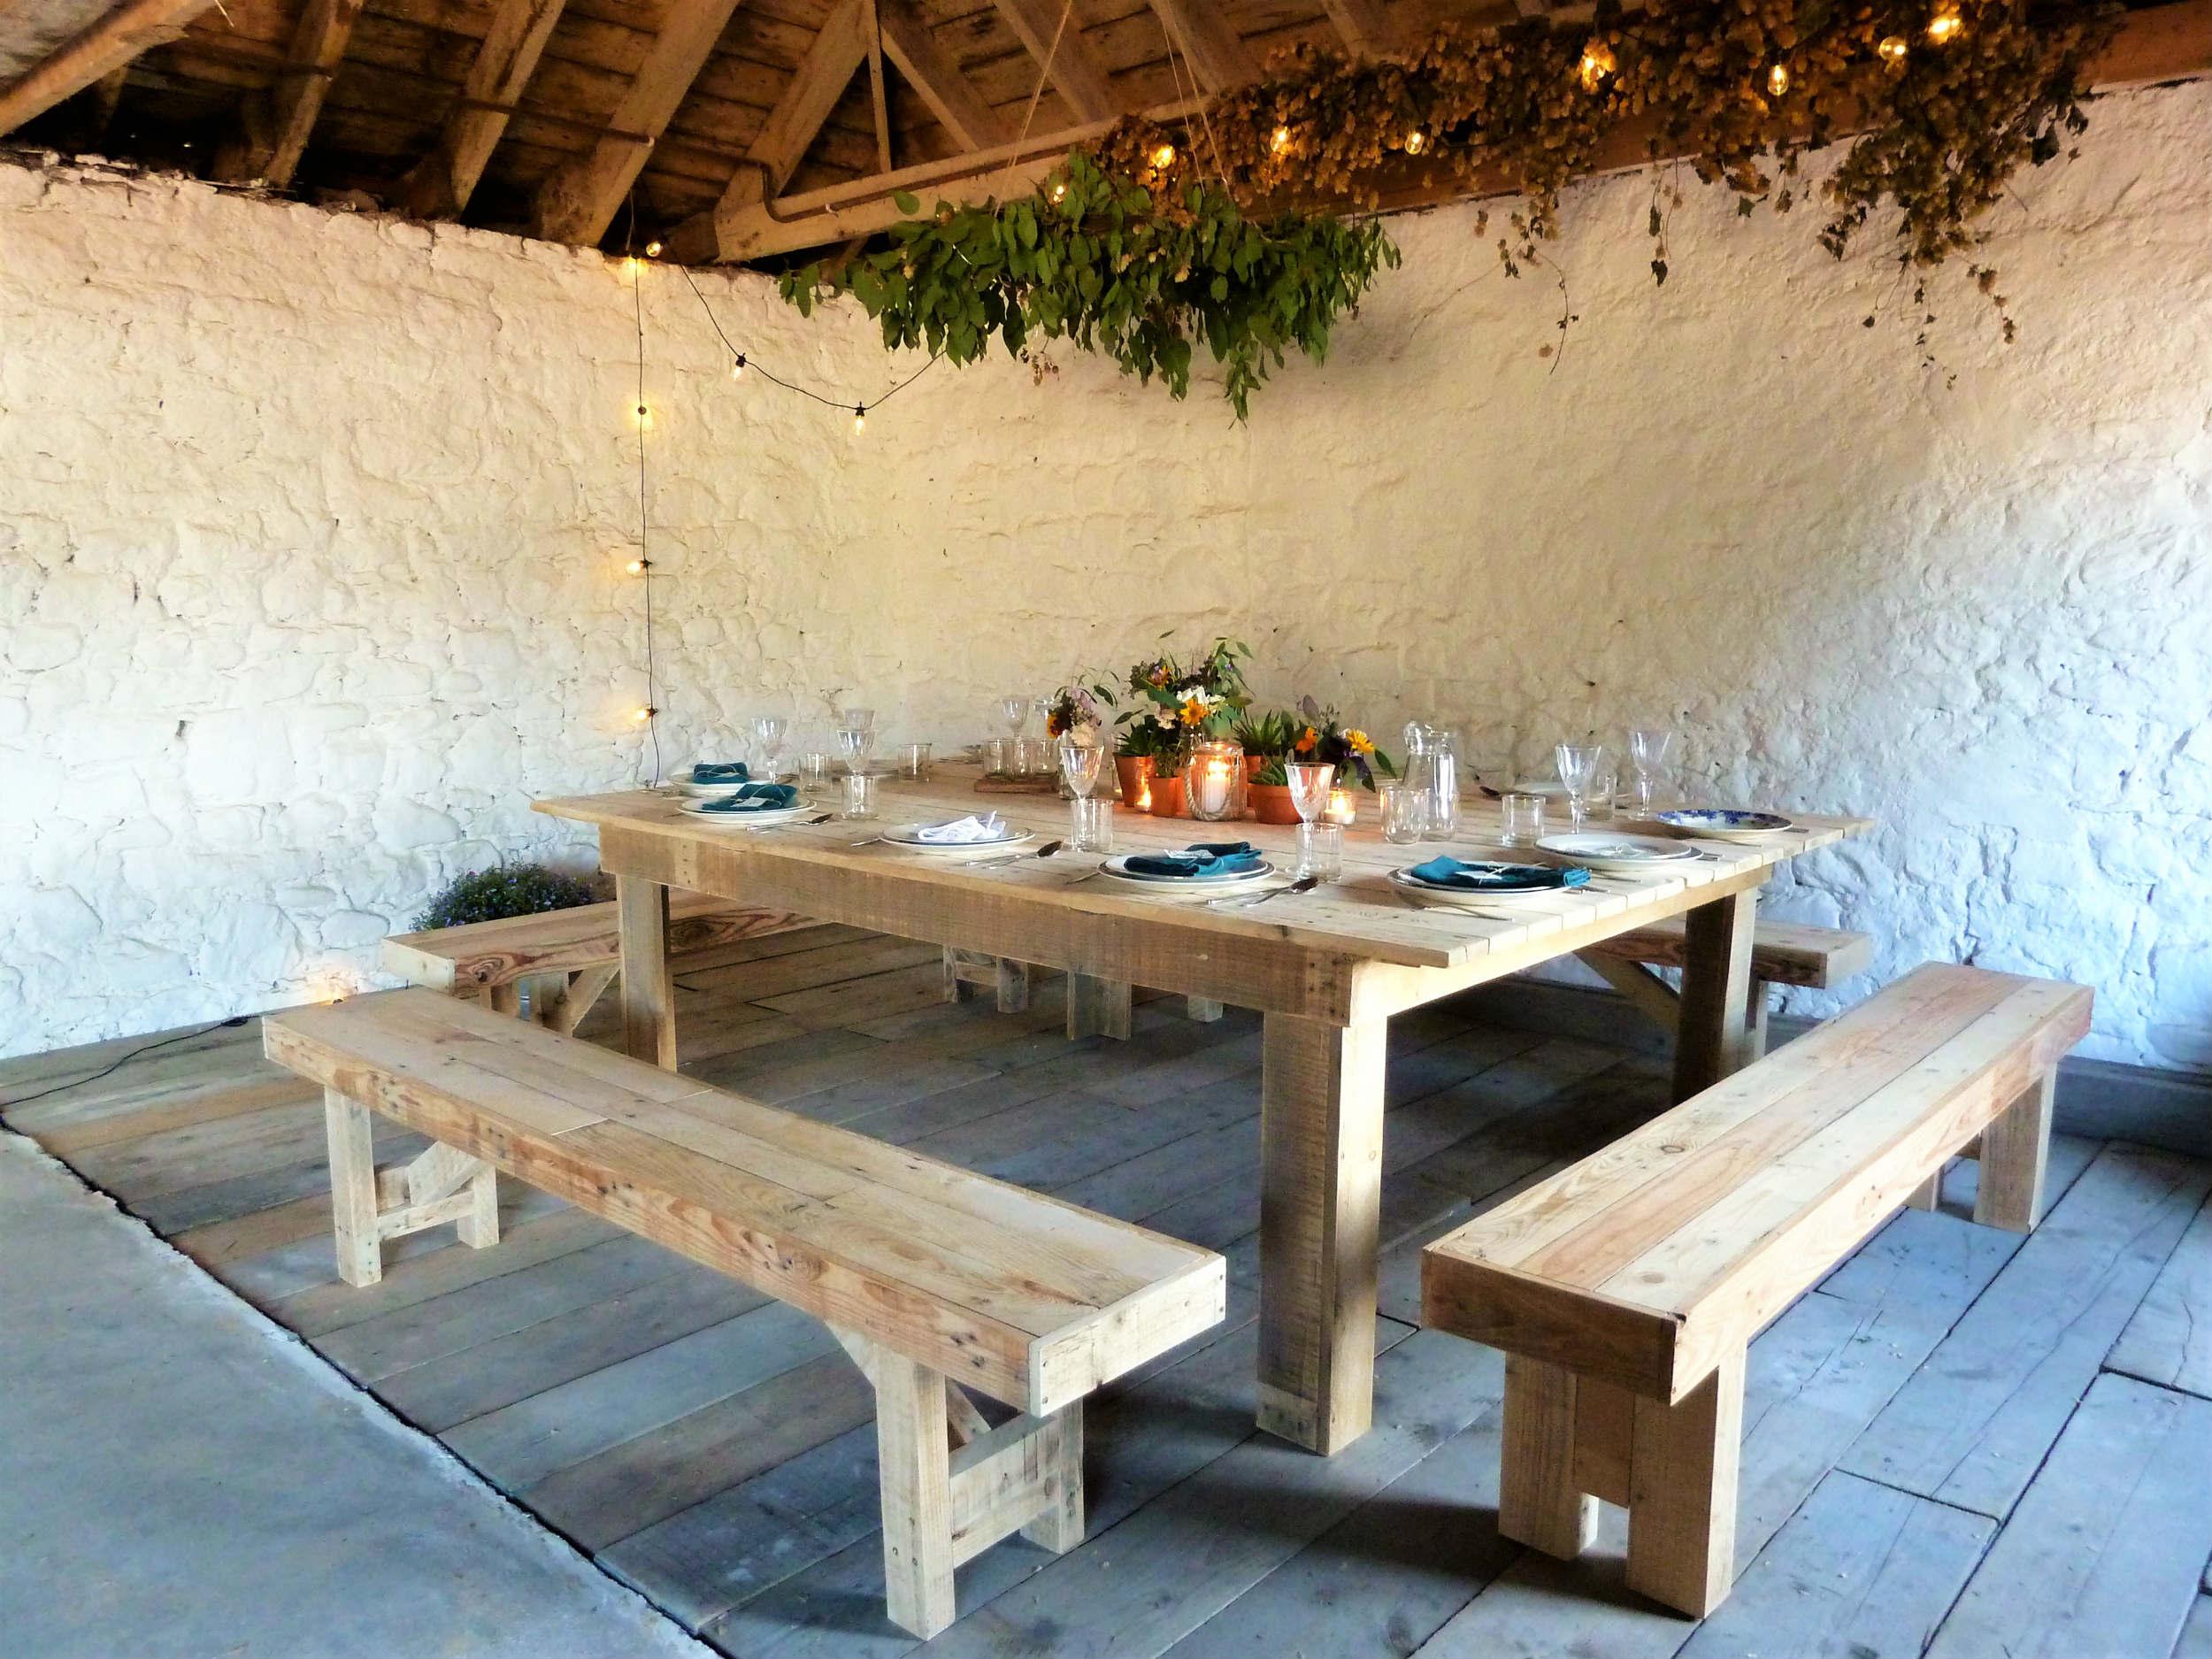 Copy of Farmhouse table | table hire